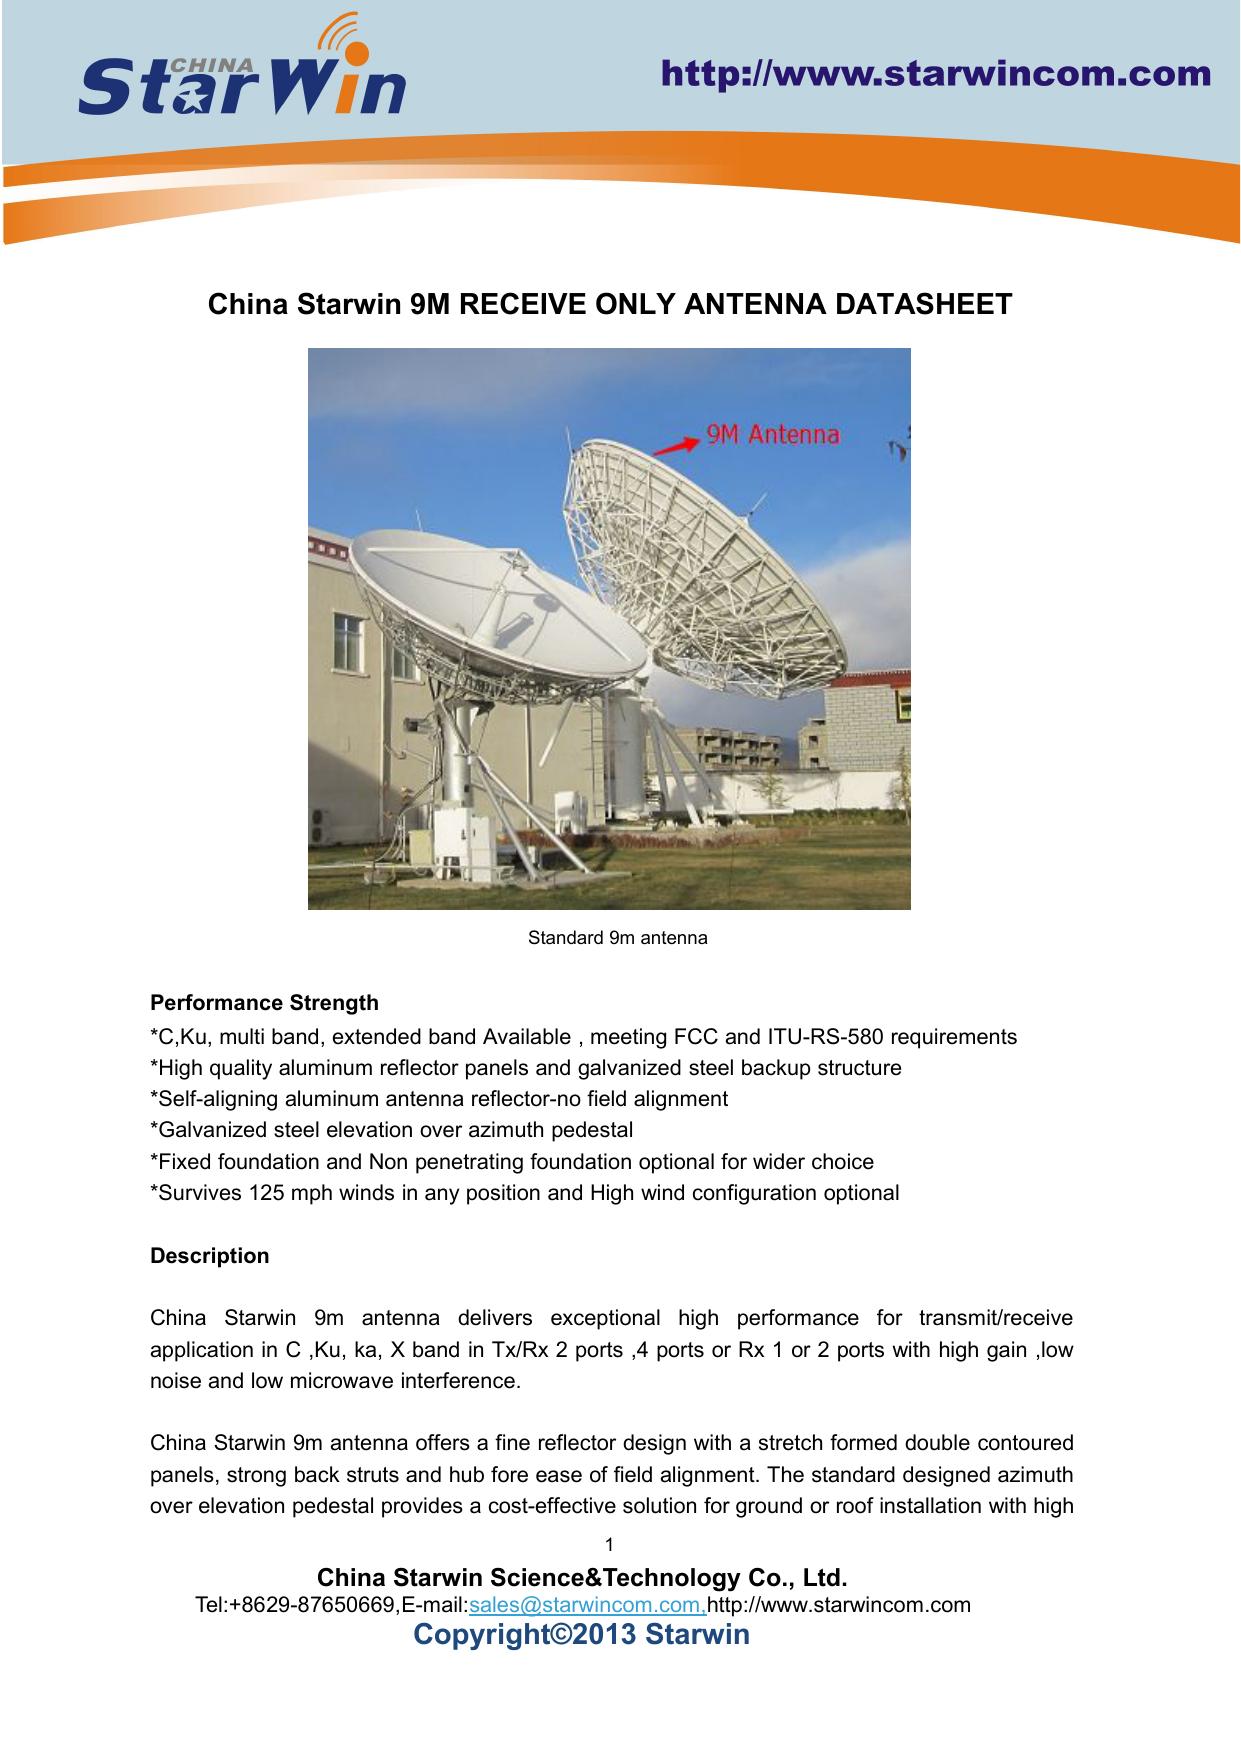 China Starwin 9m Rx Only Antenna Datasheet(Cass Grain) | manualzz com